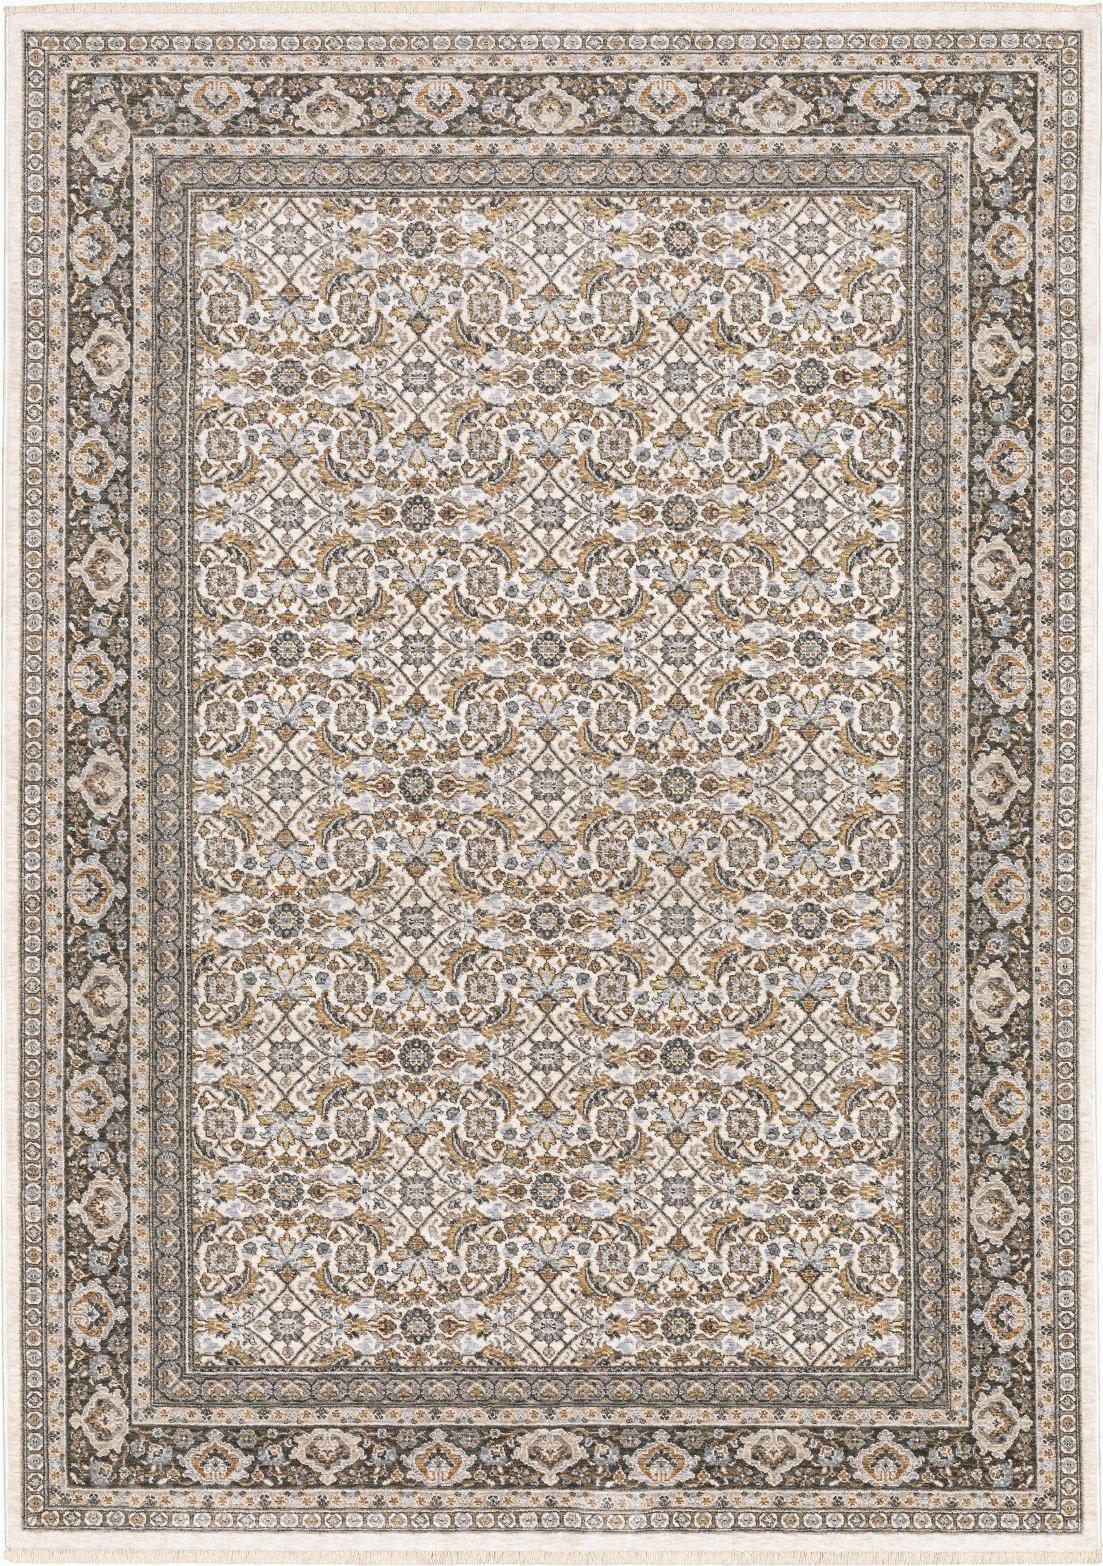 Ivory and Charcoal area Rug oriental Weavers Maharaja 2061n Ivory Charcoal area Rug